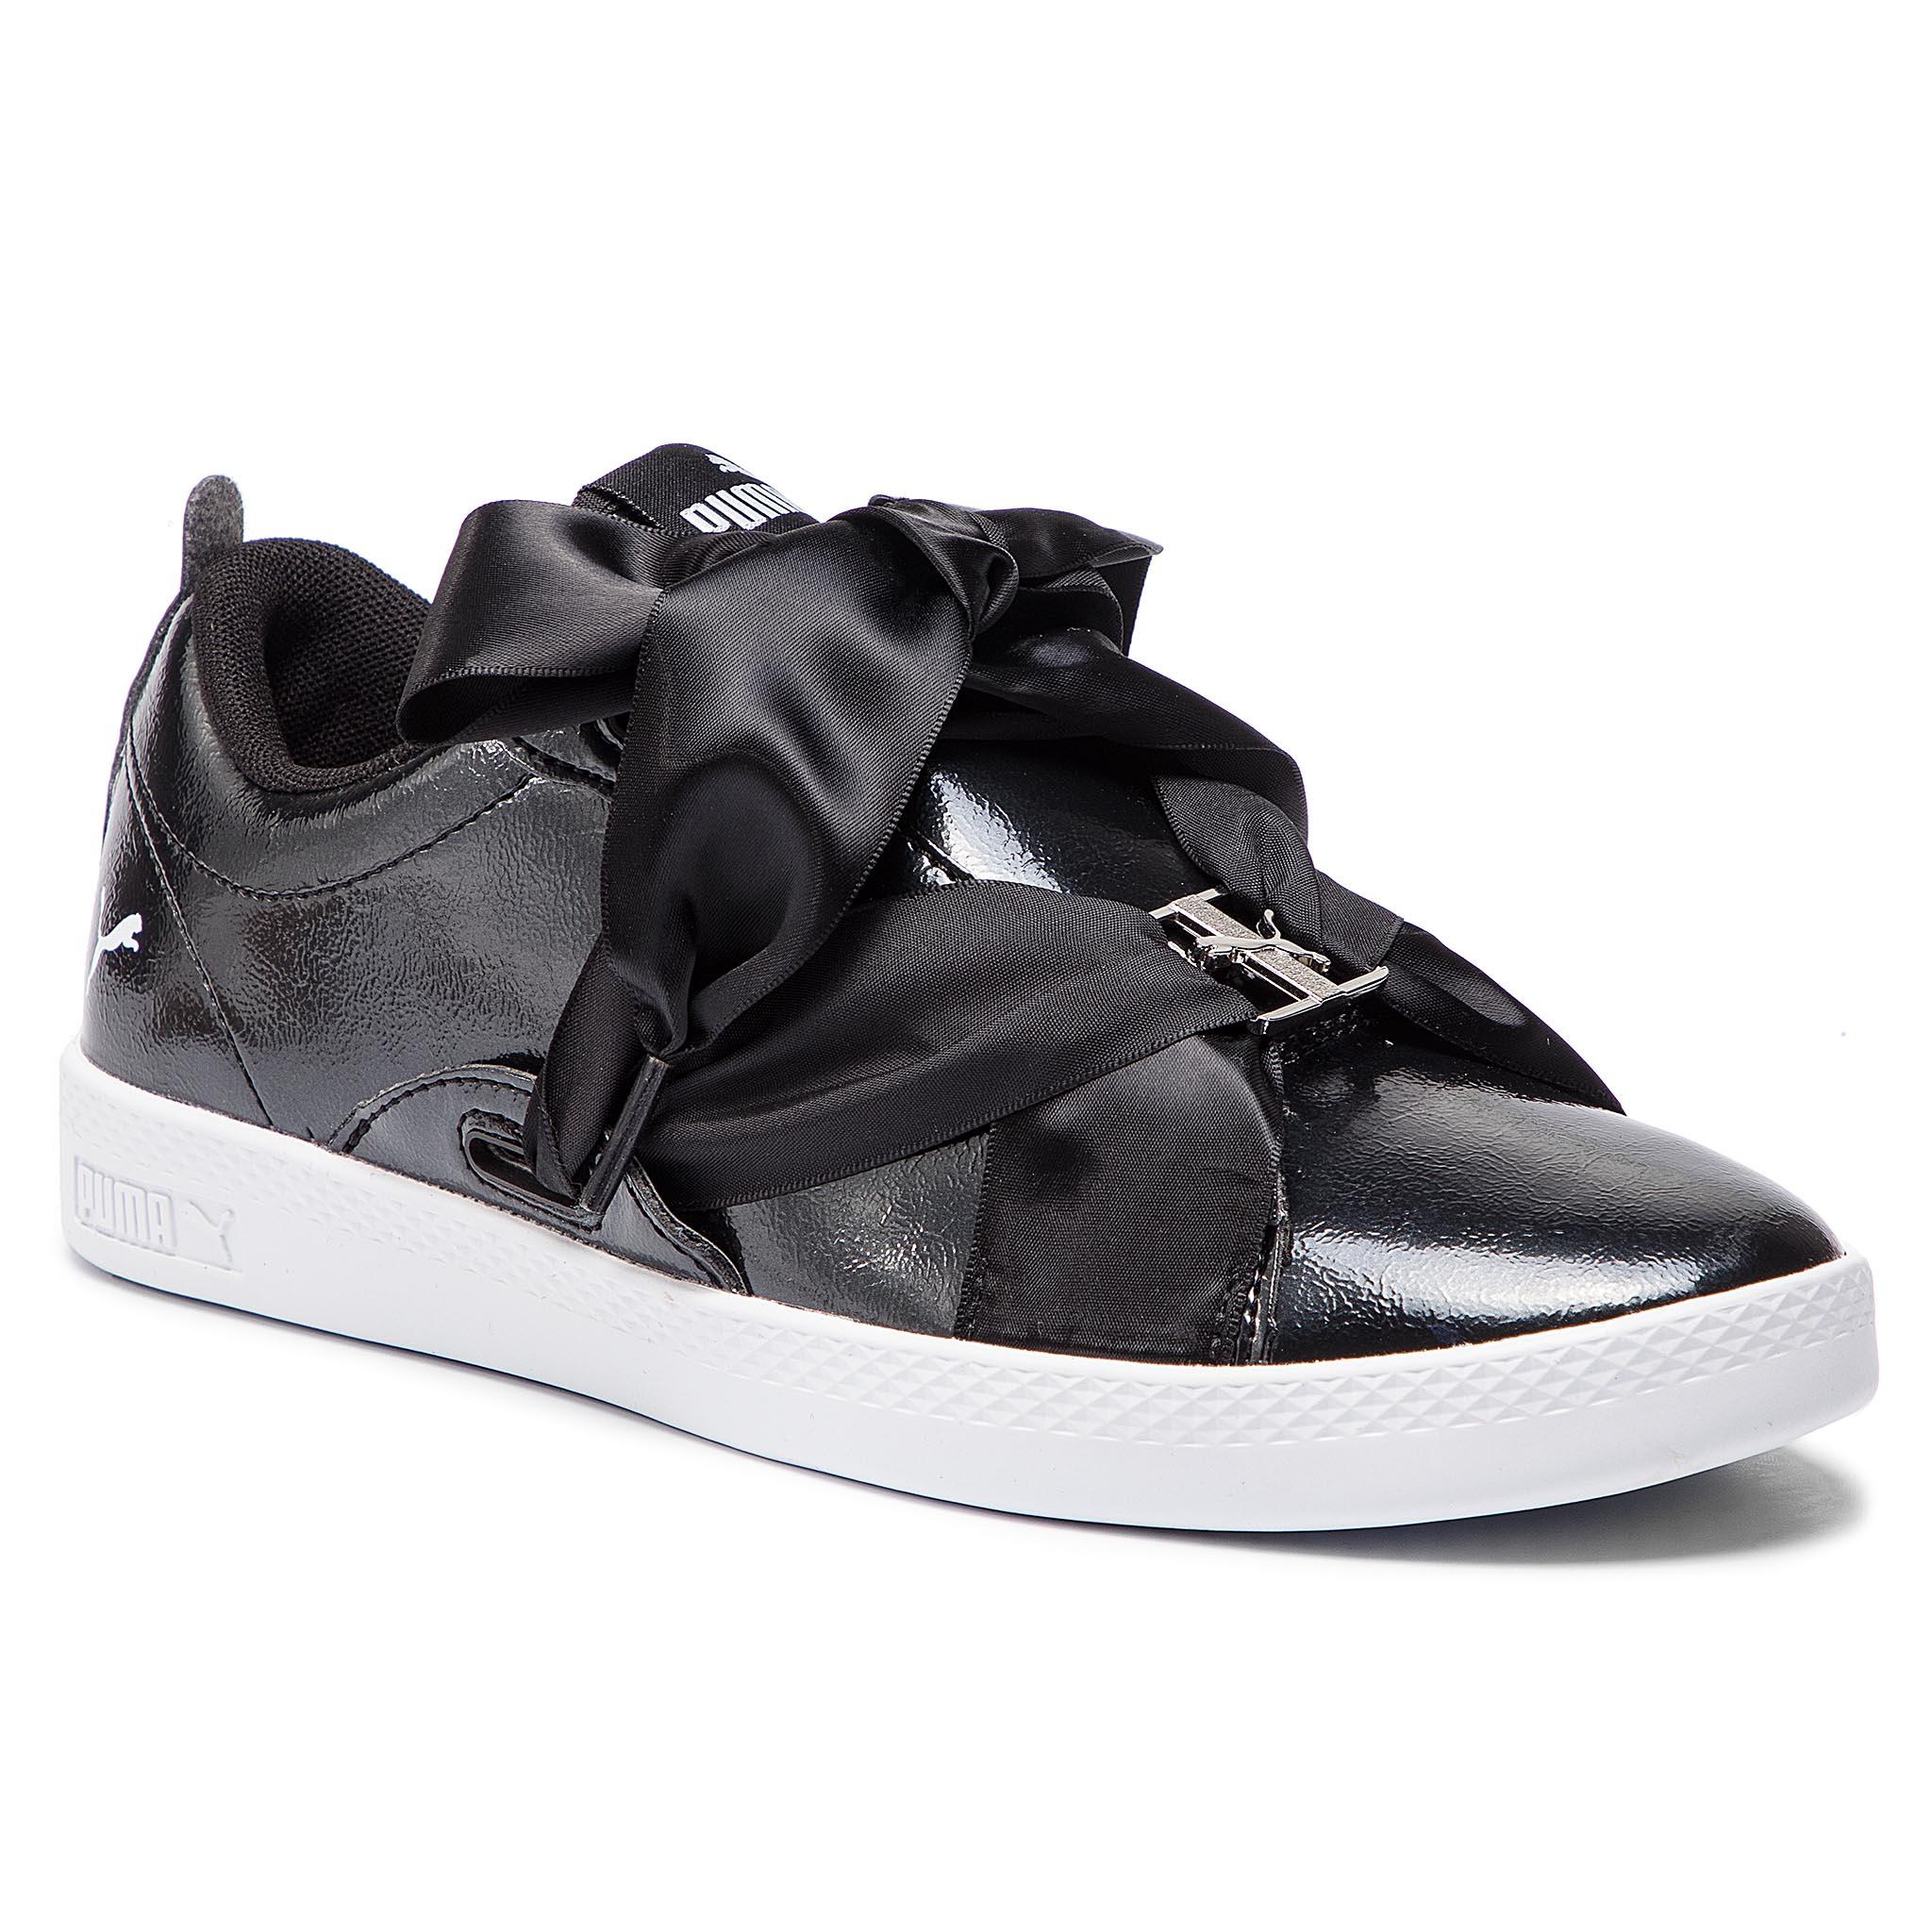 the best attitude e7543 1e56f Sneakers PUMA - Suede Heart Celebrate 365561 03 Infinity ...